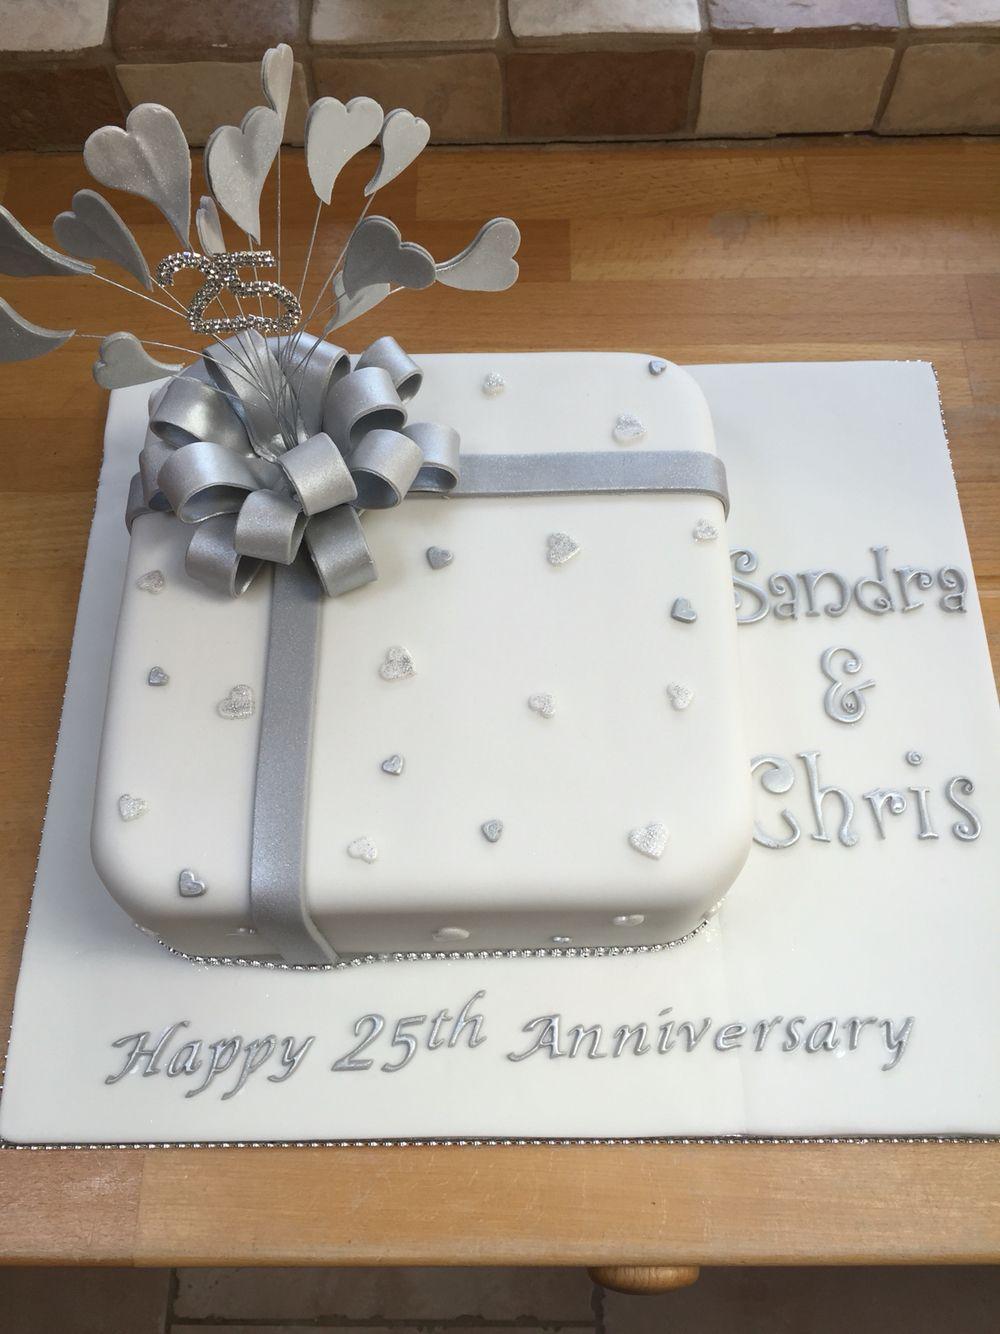 Silver anniversary cake | 25th wedding anniversary ideas | Pinterest ...